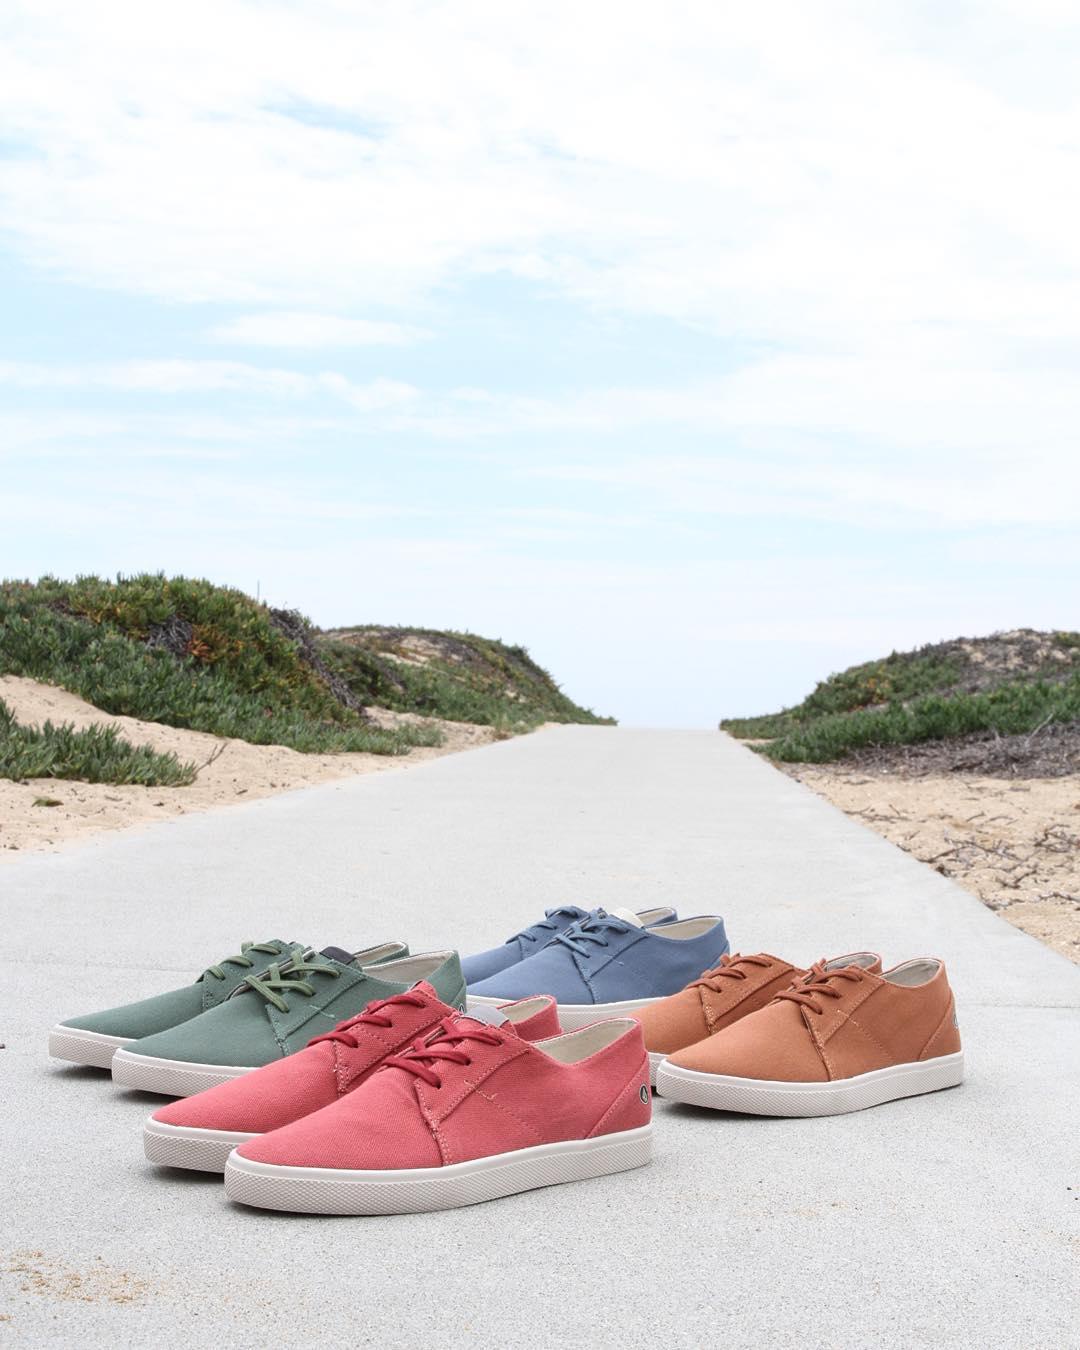 Verano Lo Fi #SS16 #volcomfootwear #TrueToThis